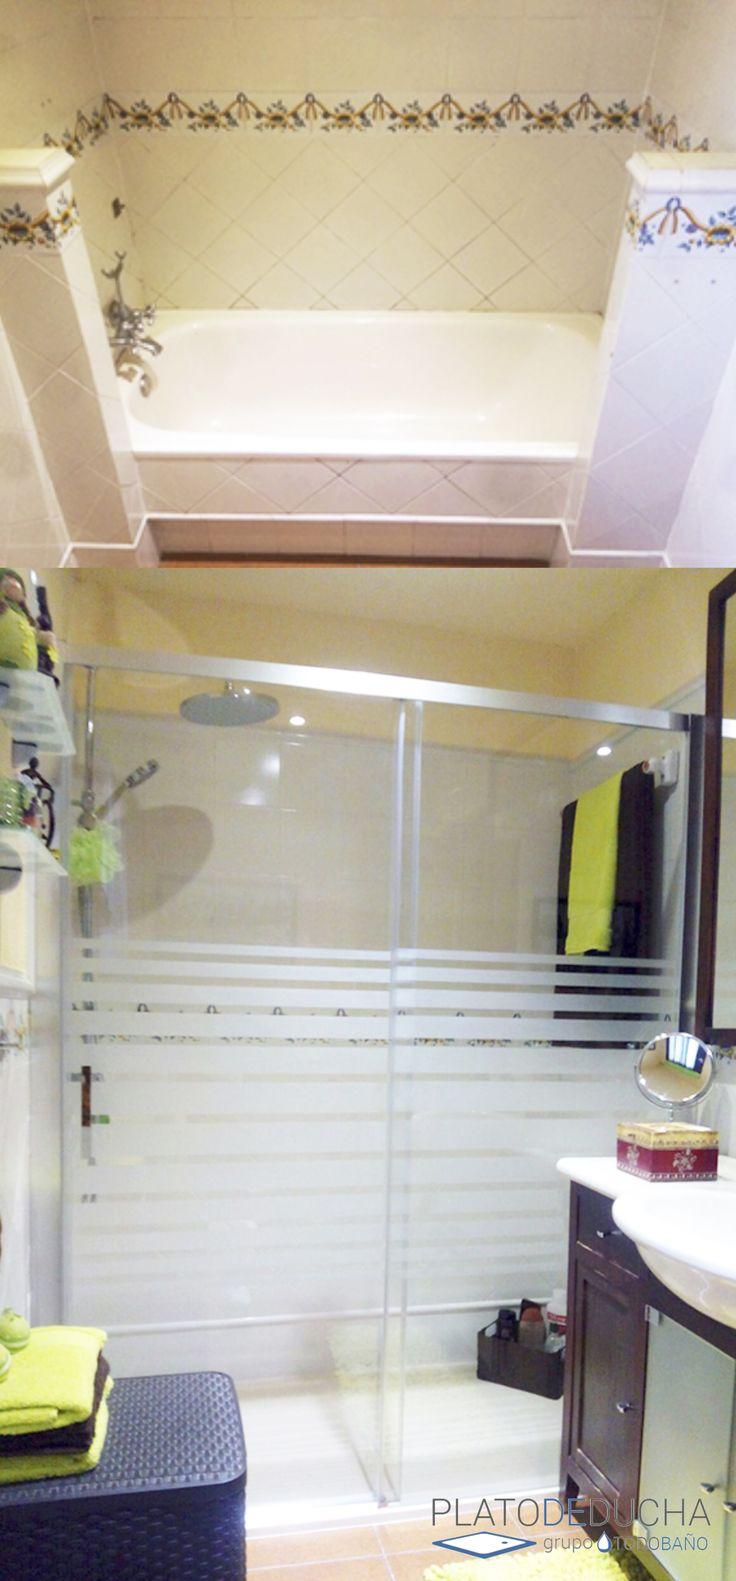 Baño Ducha Banera Pequena Idea:de 1000 ideas sobre Pequeñas Duchas De Baño en Pinterest